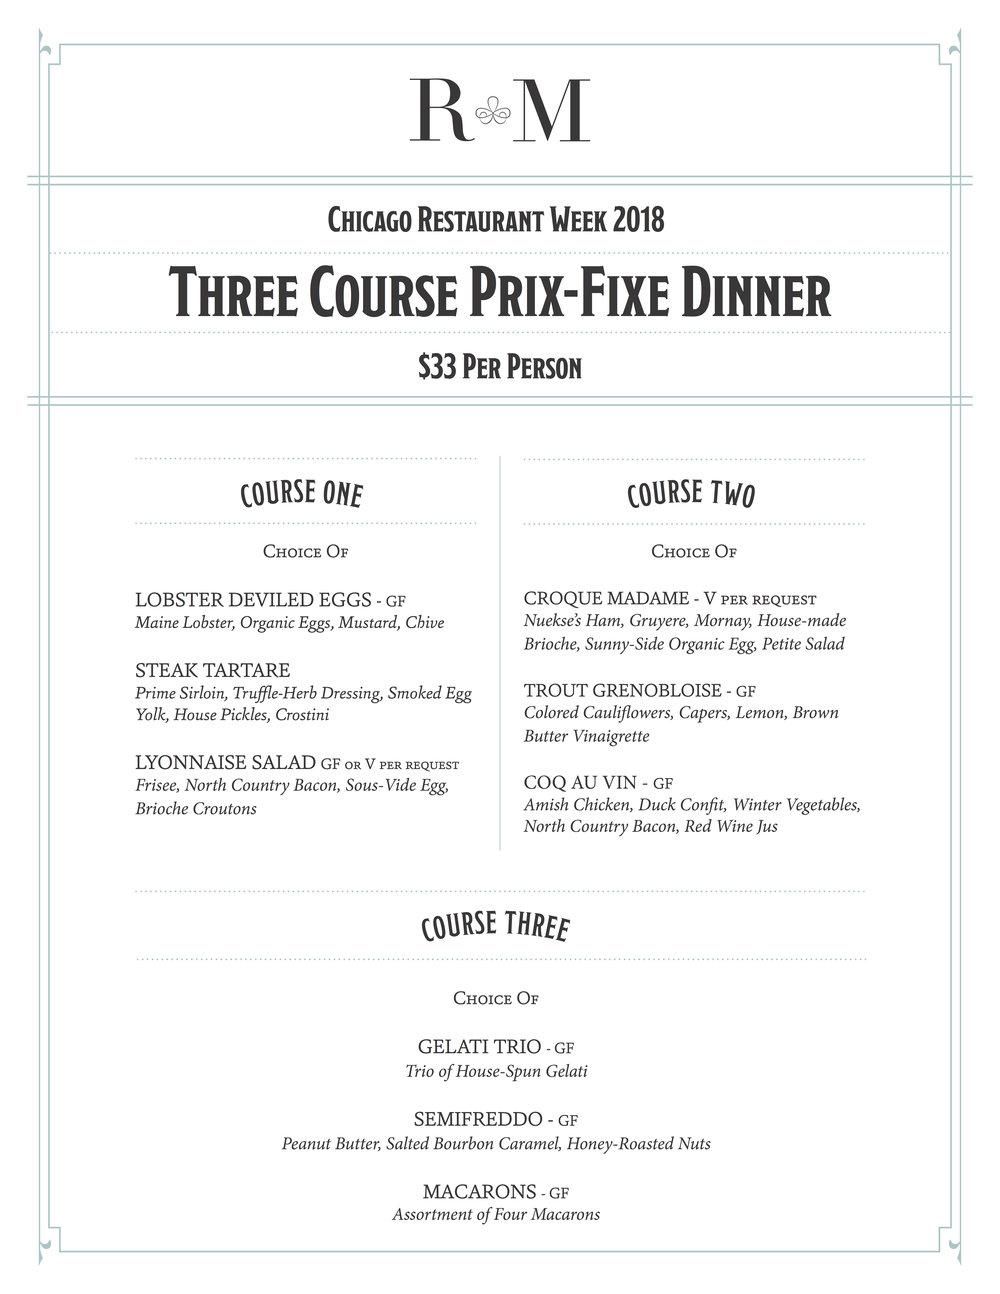 RM_RestaurantWeek2018.jpg